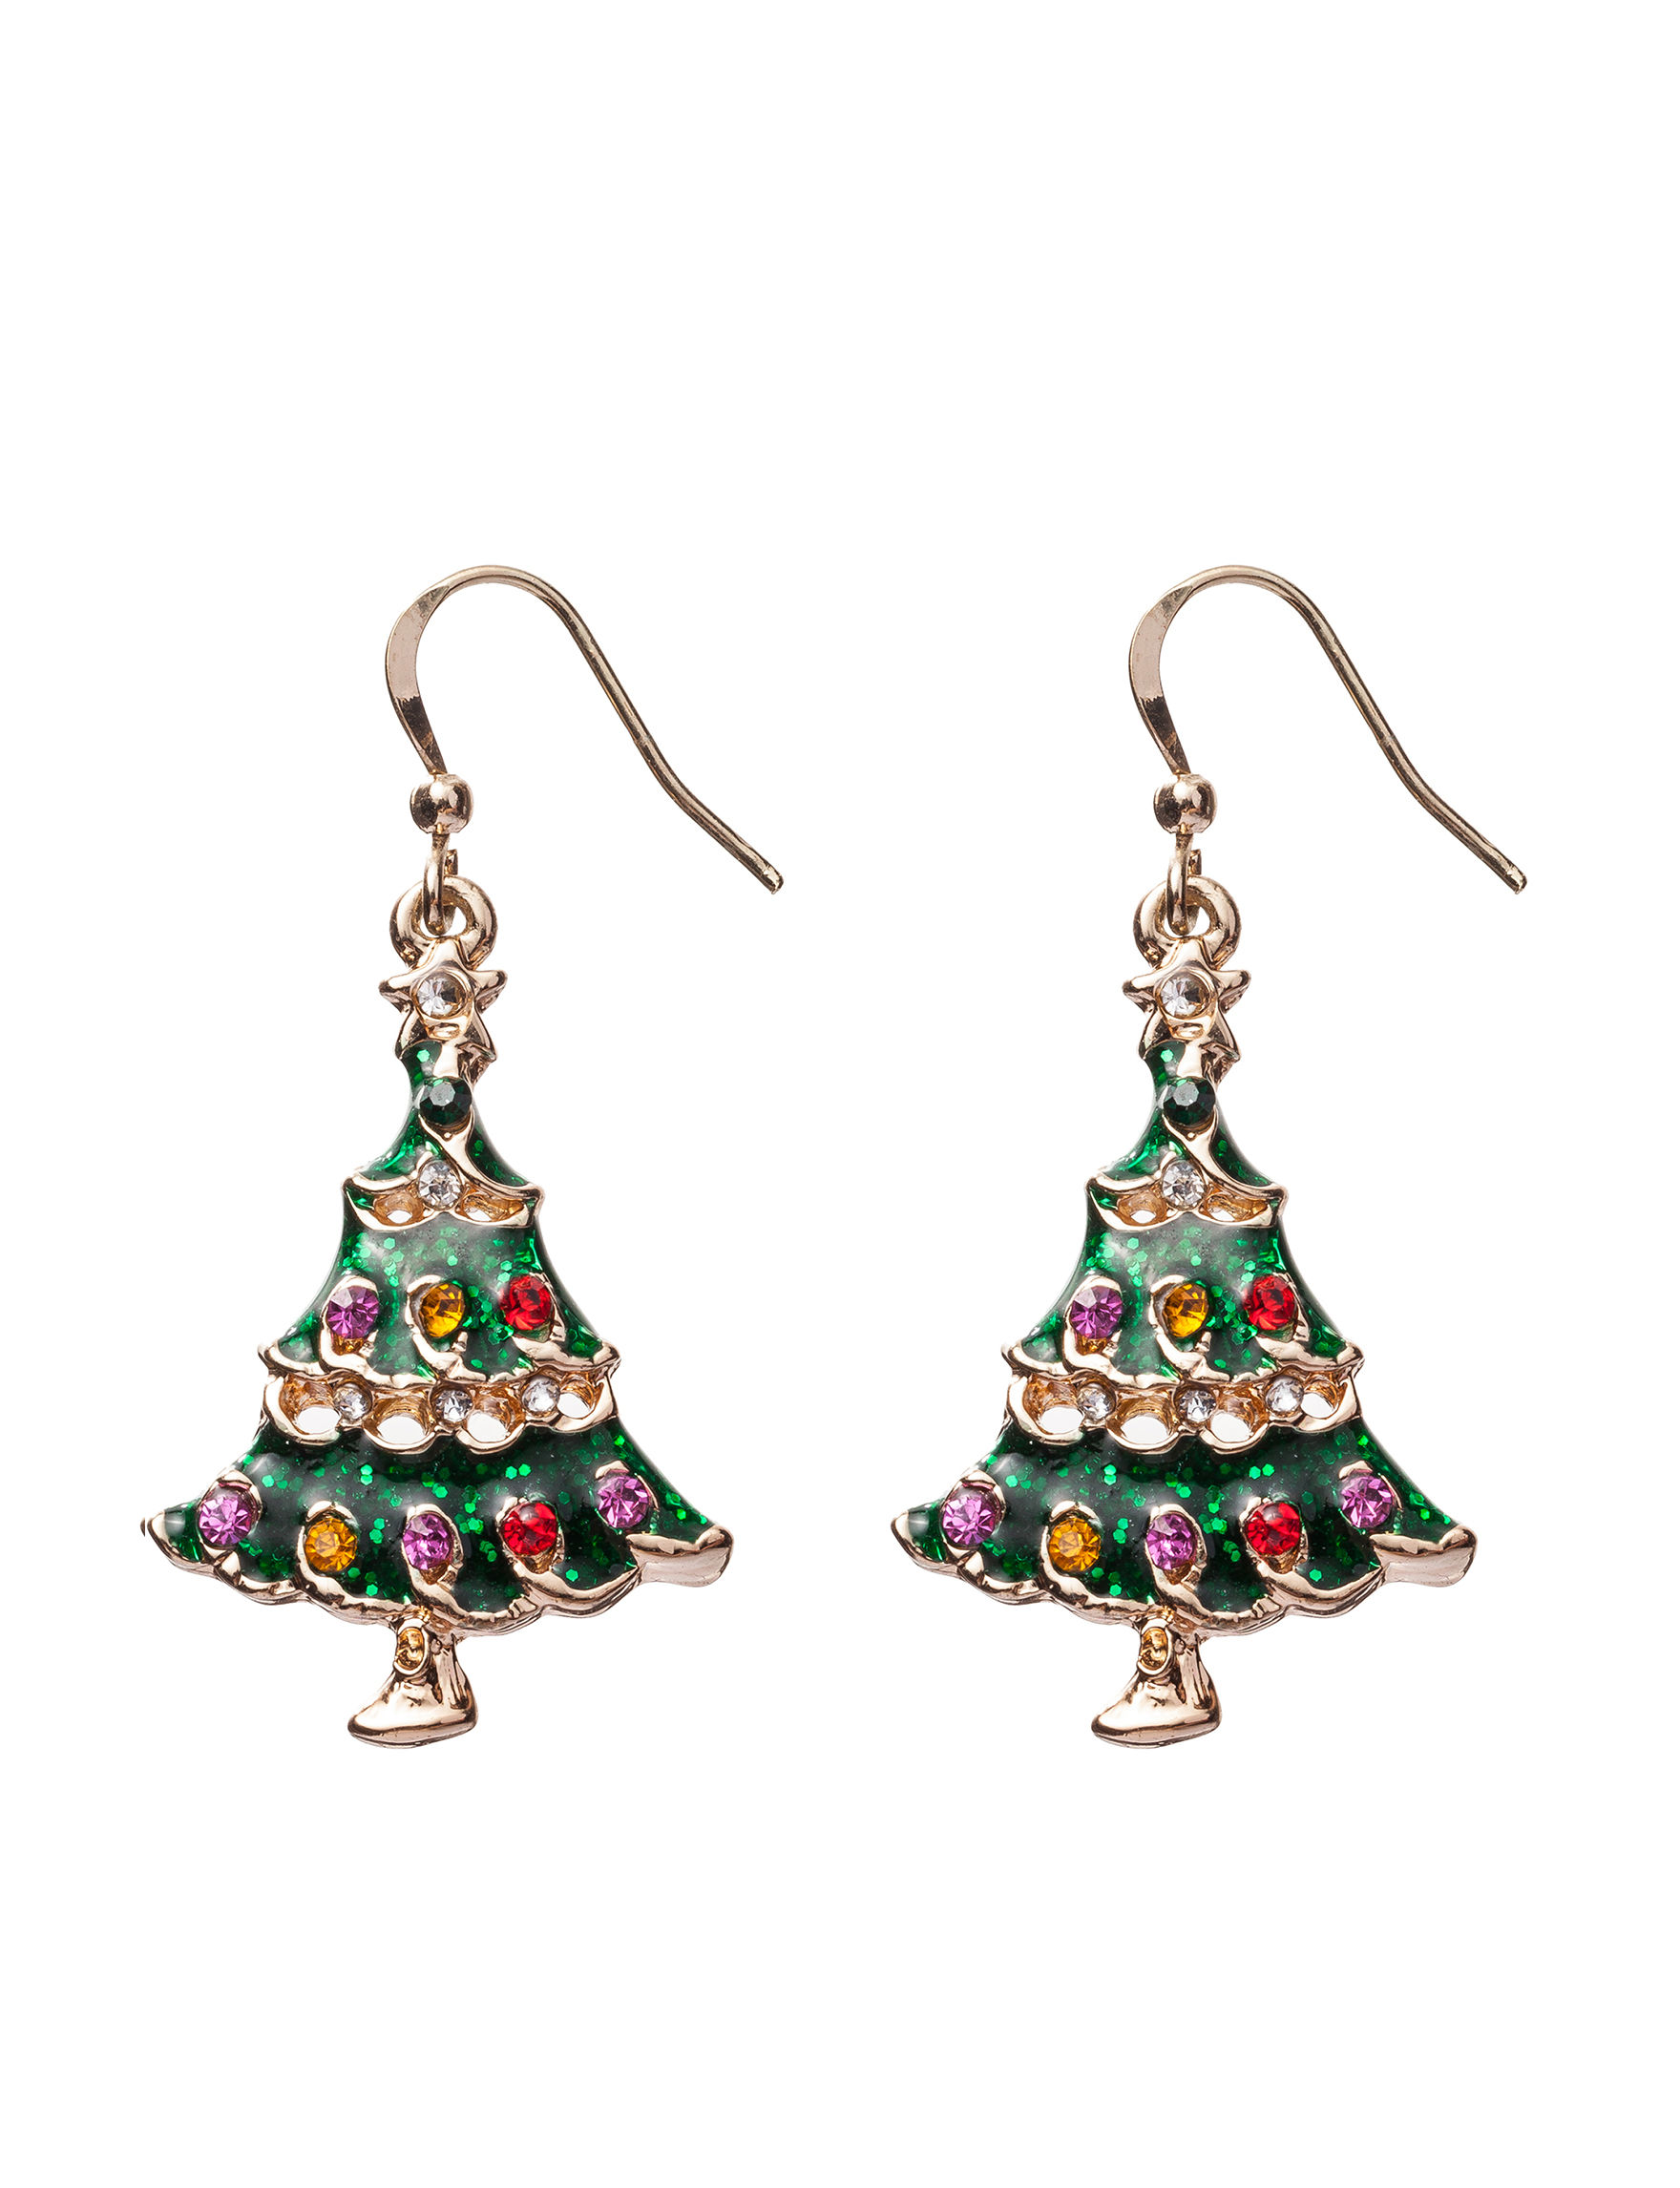 Hannah White / Silver Drops Earrings Fashion Jewelry